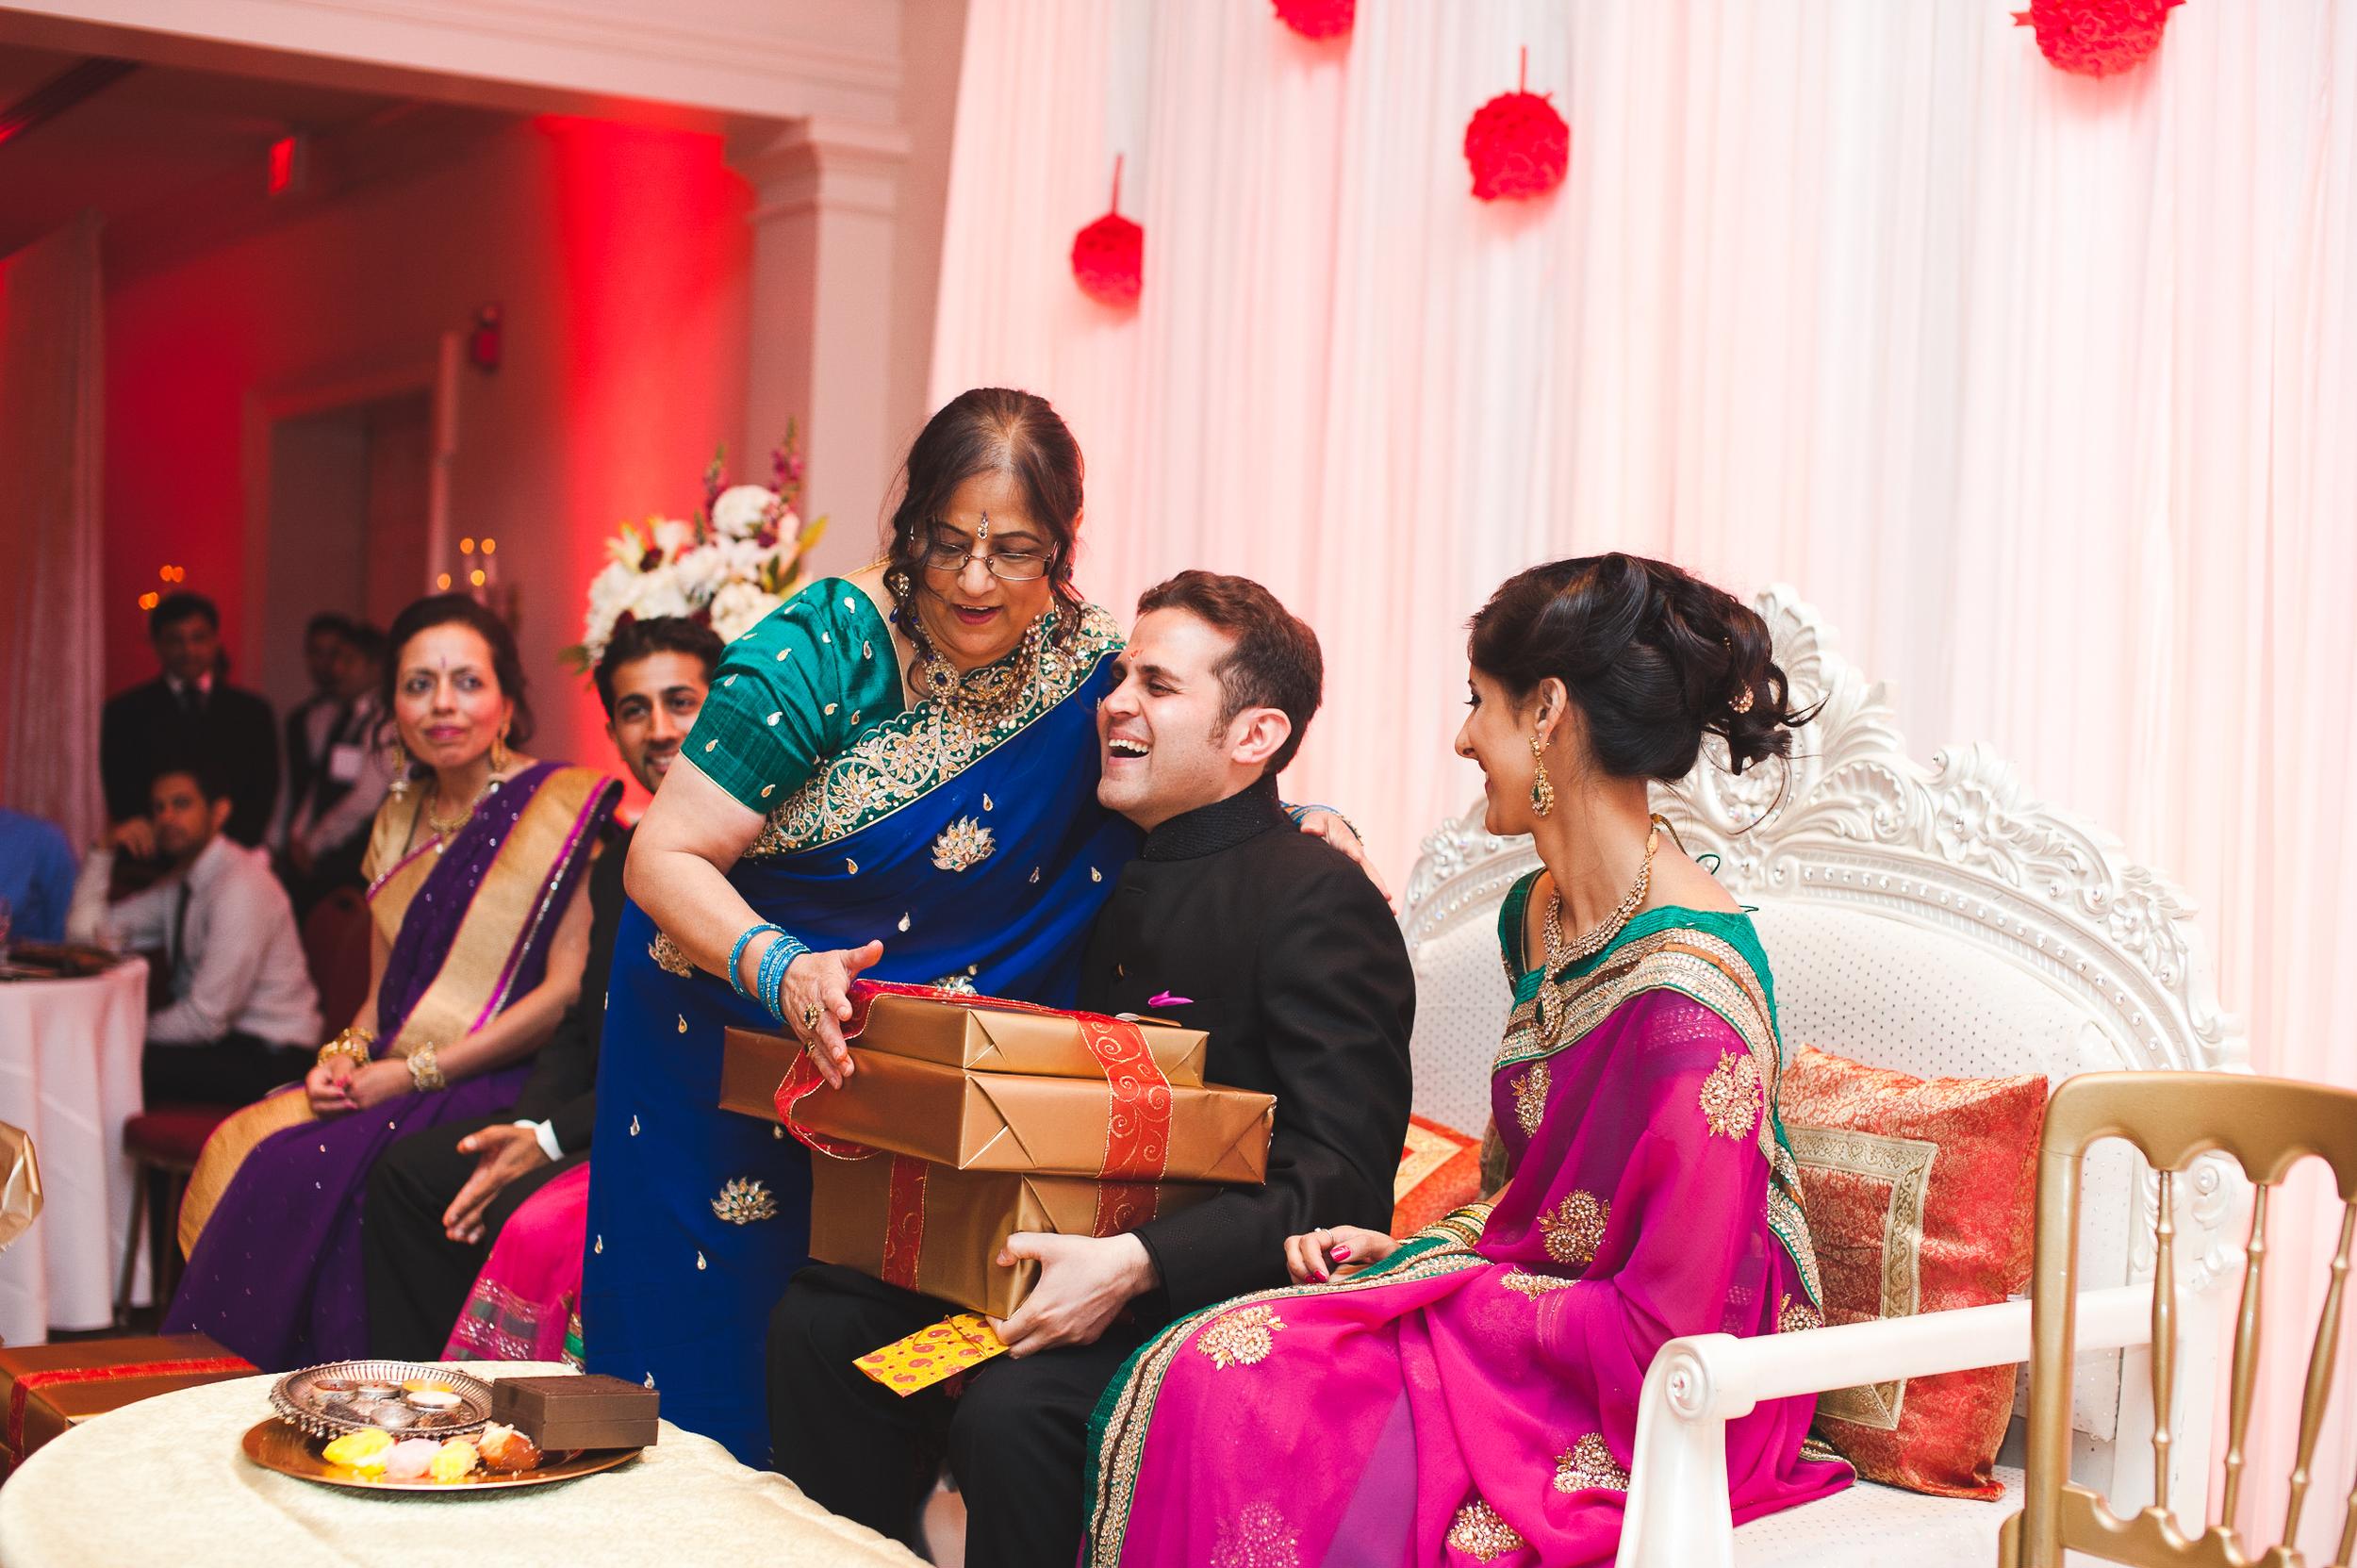 Indian wedding photographer washington dc Mantas Kubilinskas-3.jpg